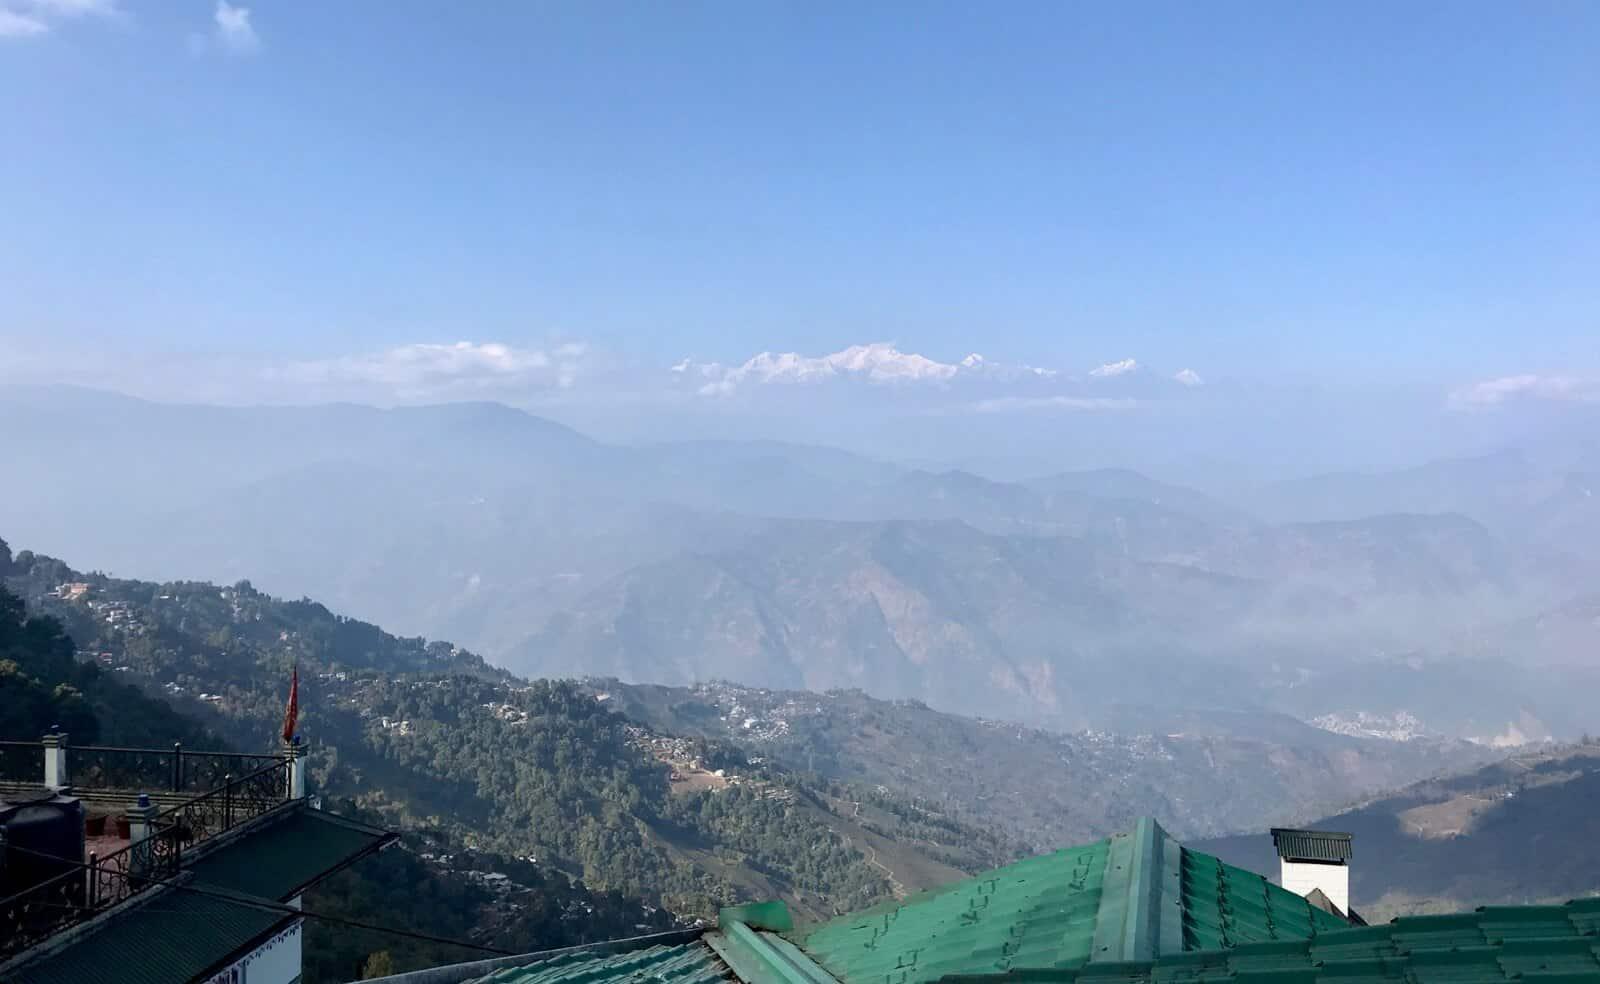 Kanchenjunga Villa Everest darjeeling hotel betternotstop